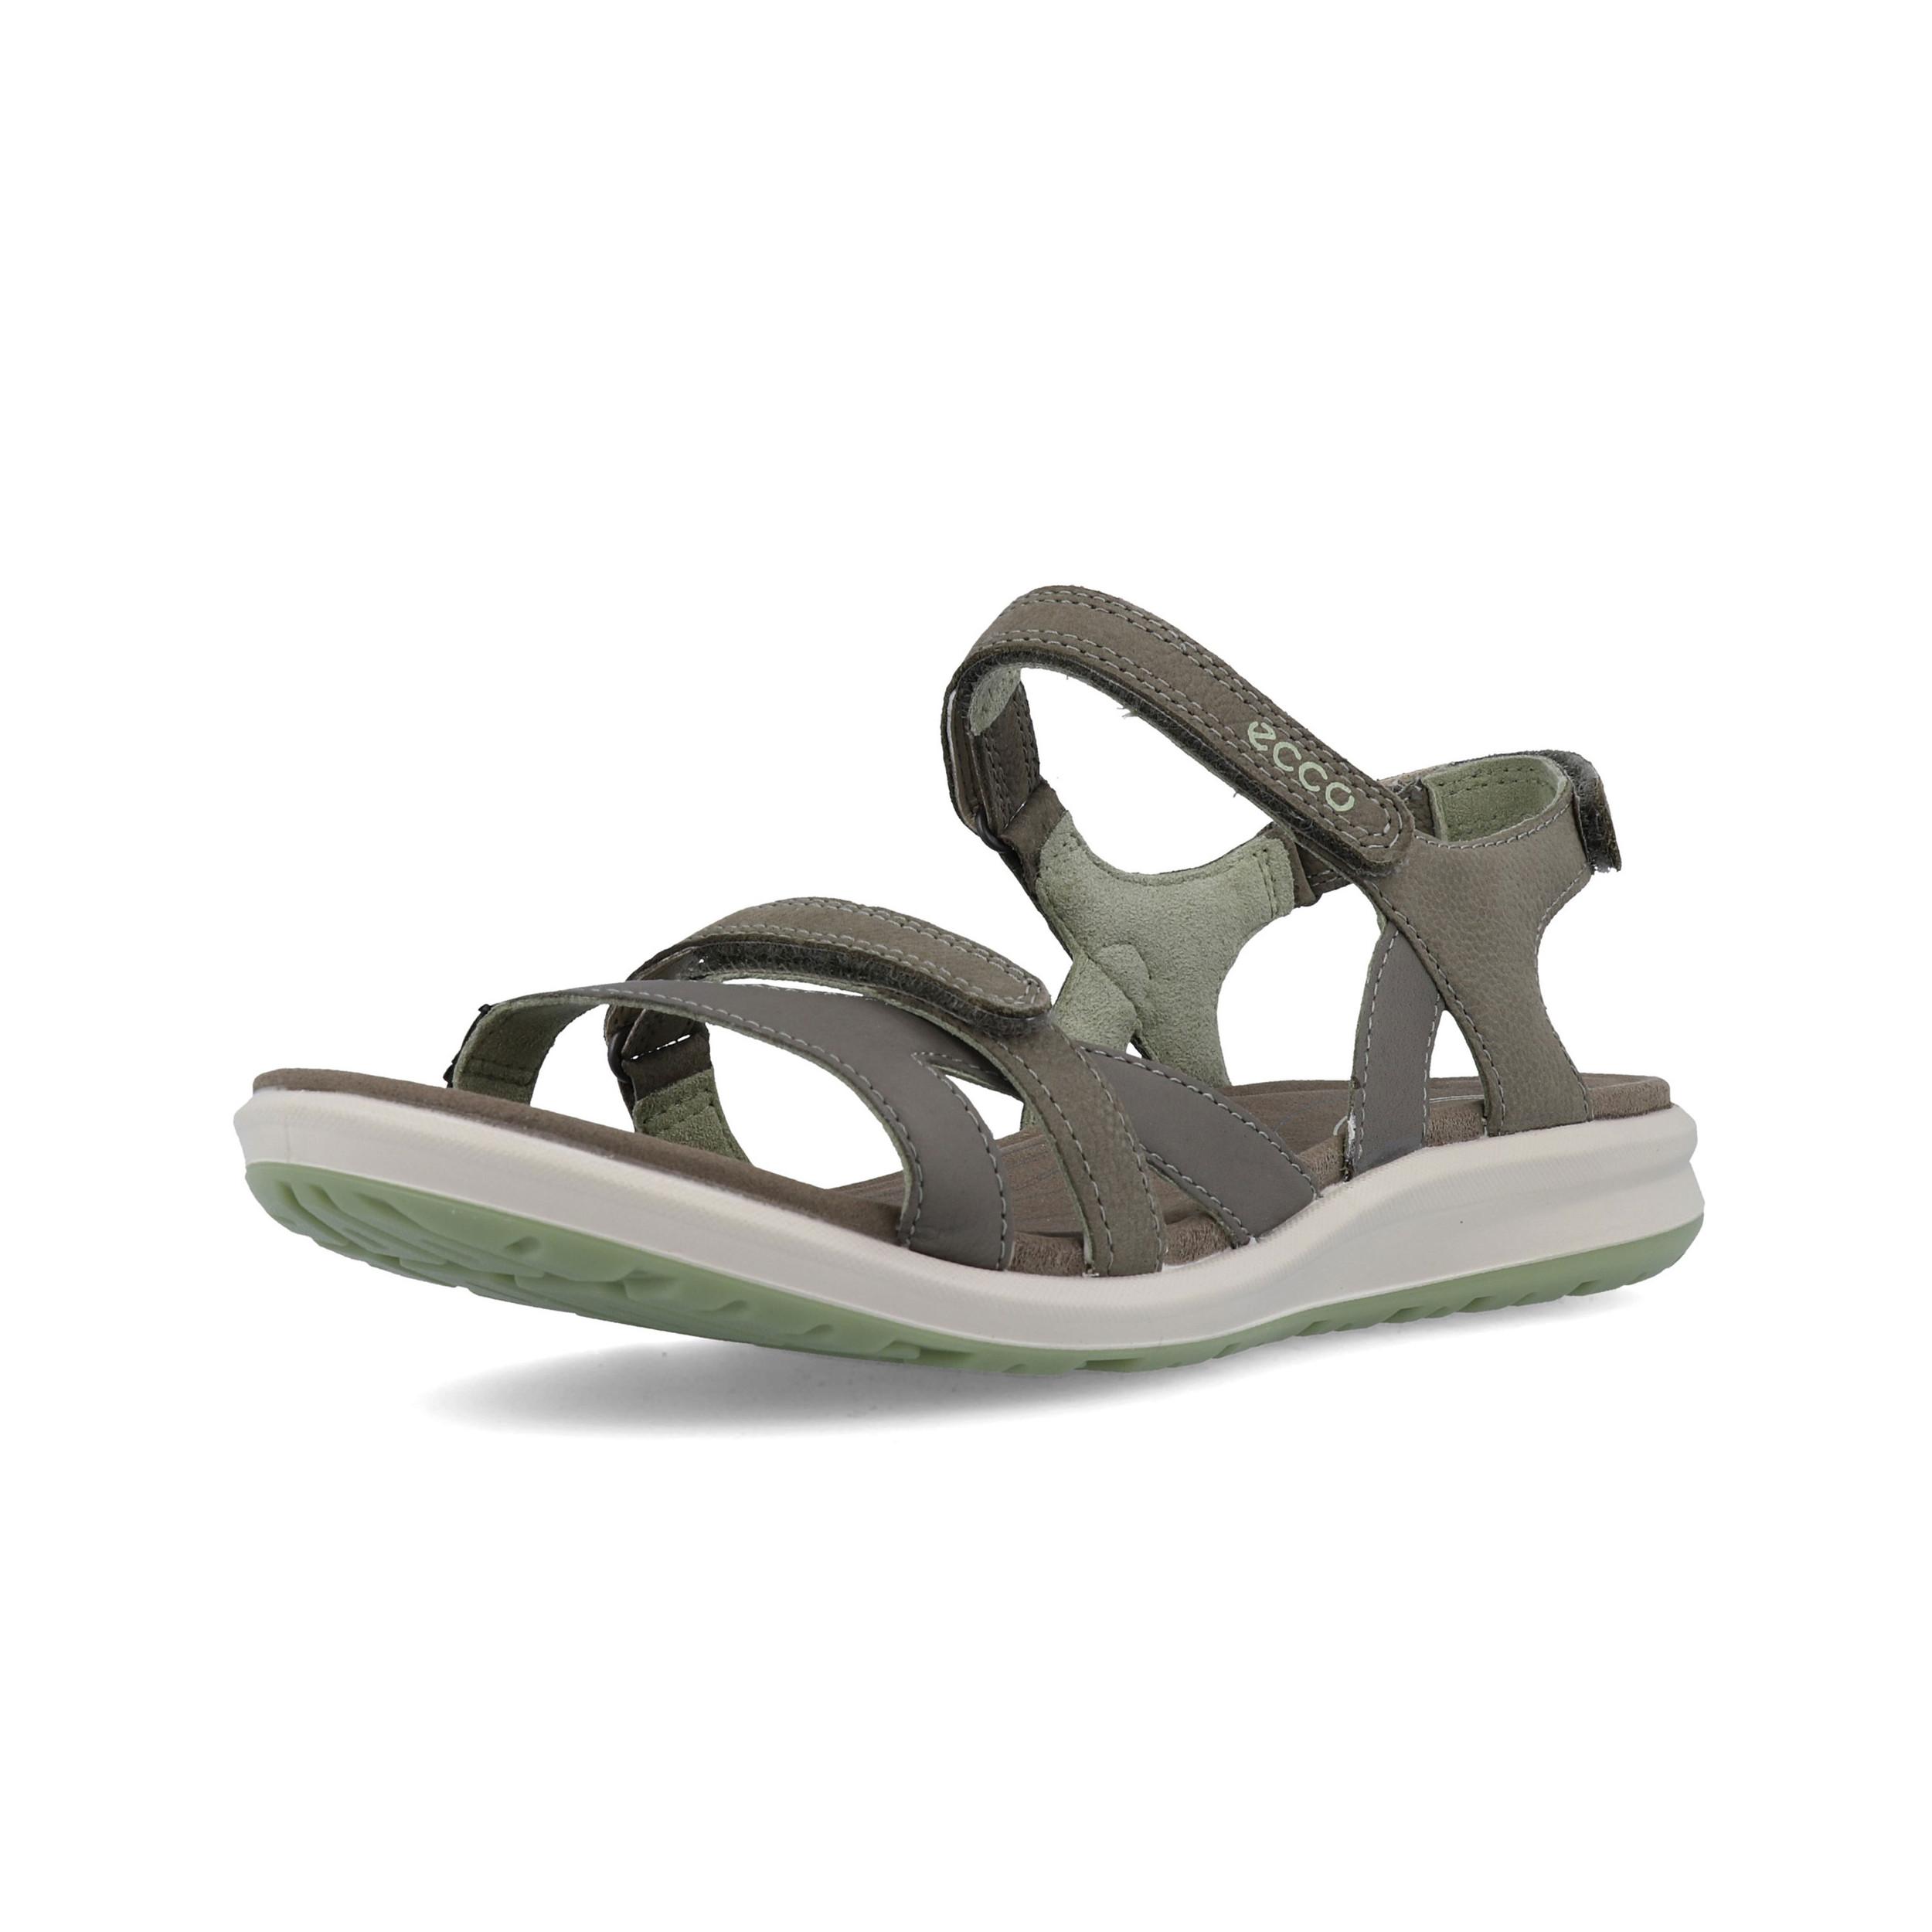 e3ae0616c74ec Ecco Womens Cruise II Walking Shoes Sandals Green Grey Sports Outdoors